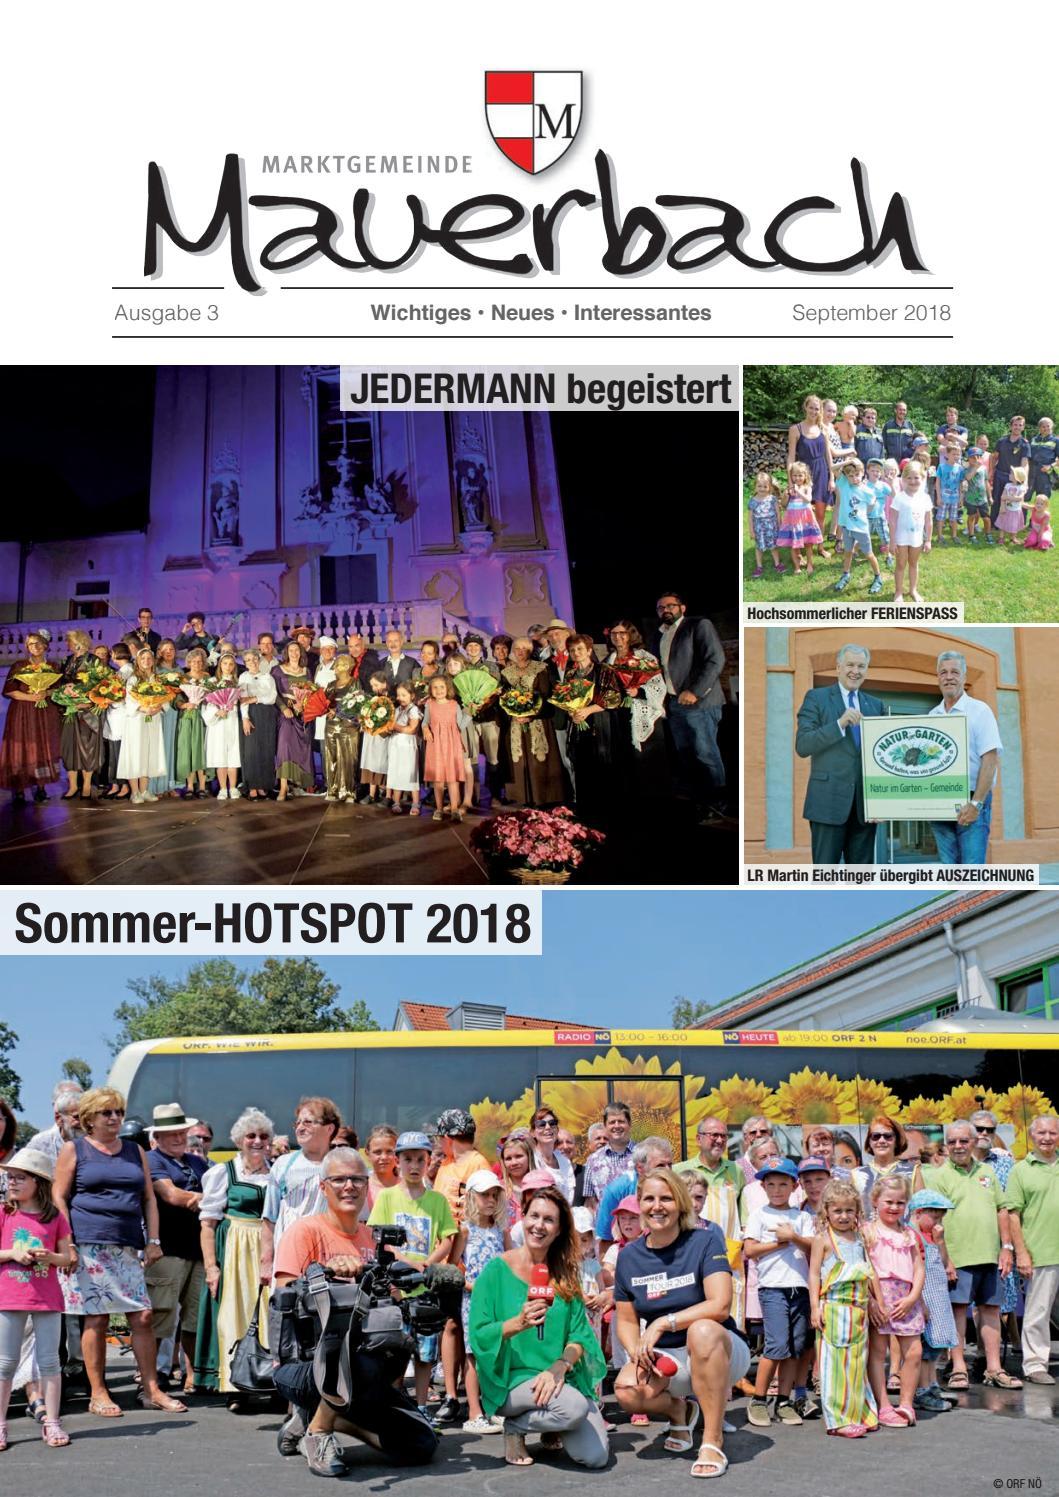 Singles Mauerbach, Kontaktanzeigen aus Mauerbach bei